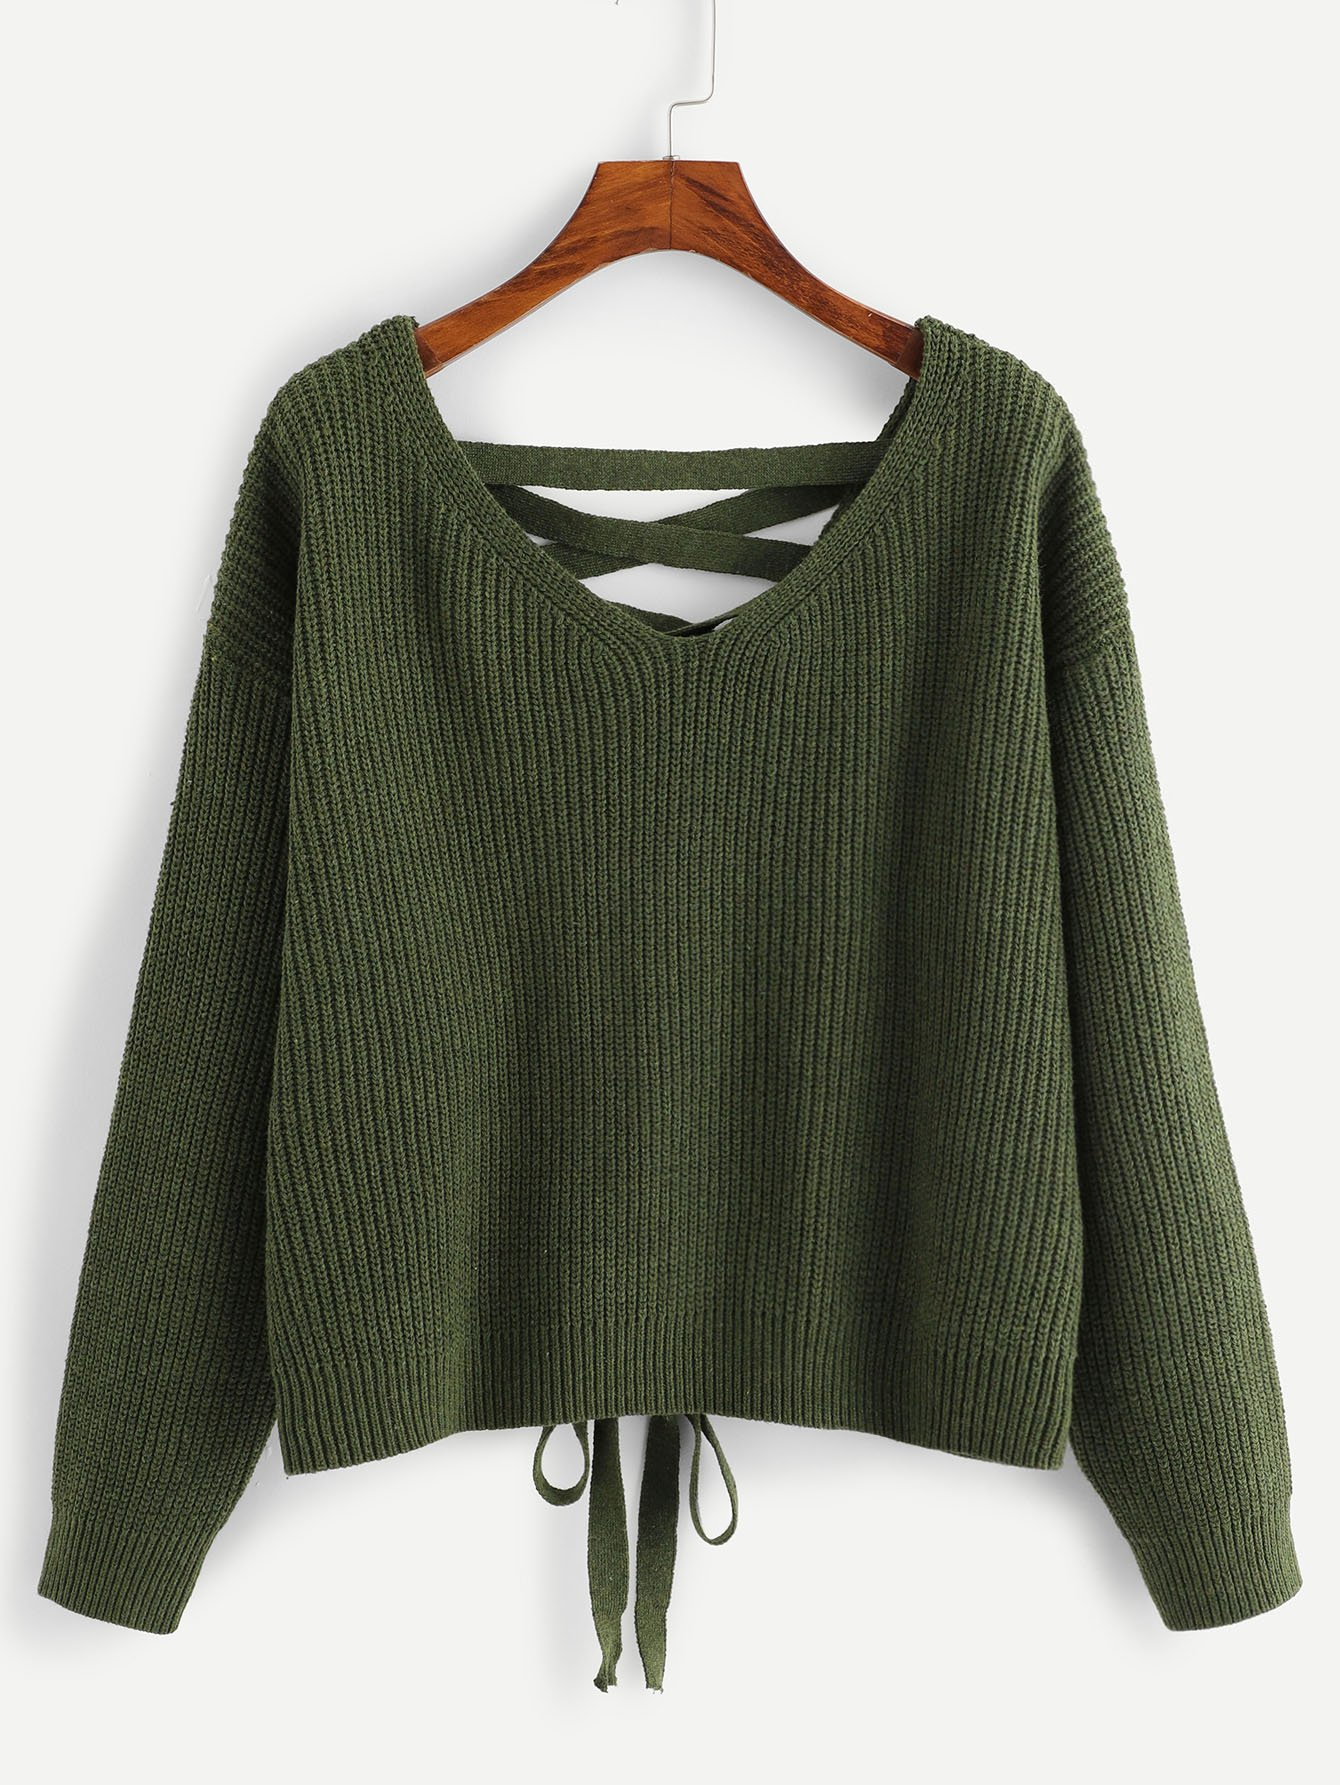 Купить Зашнуруйте вниз плечо плеча свитера, null, SheIn